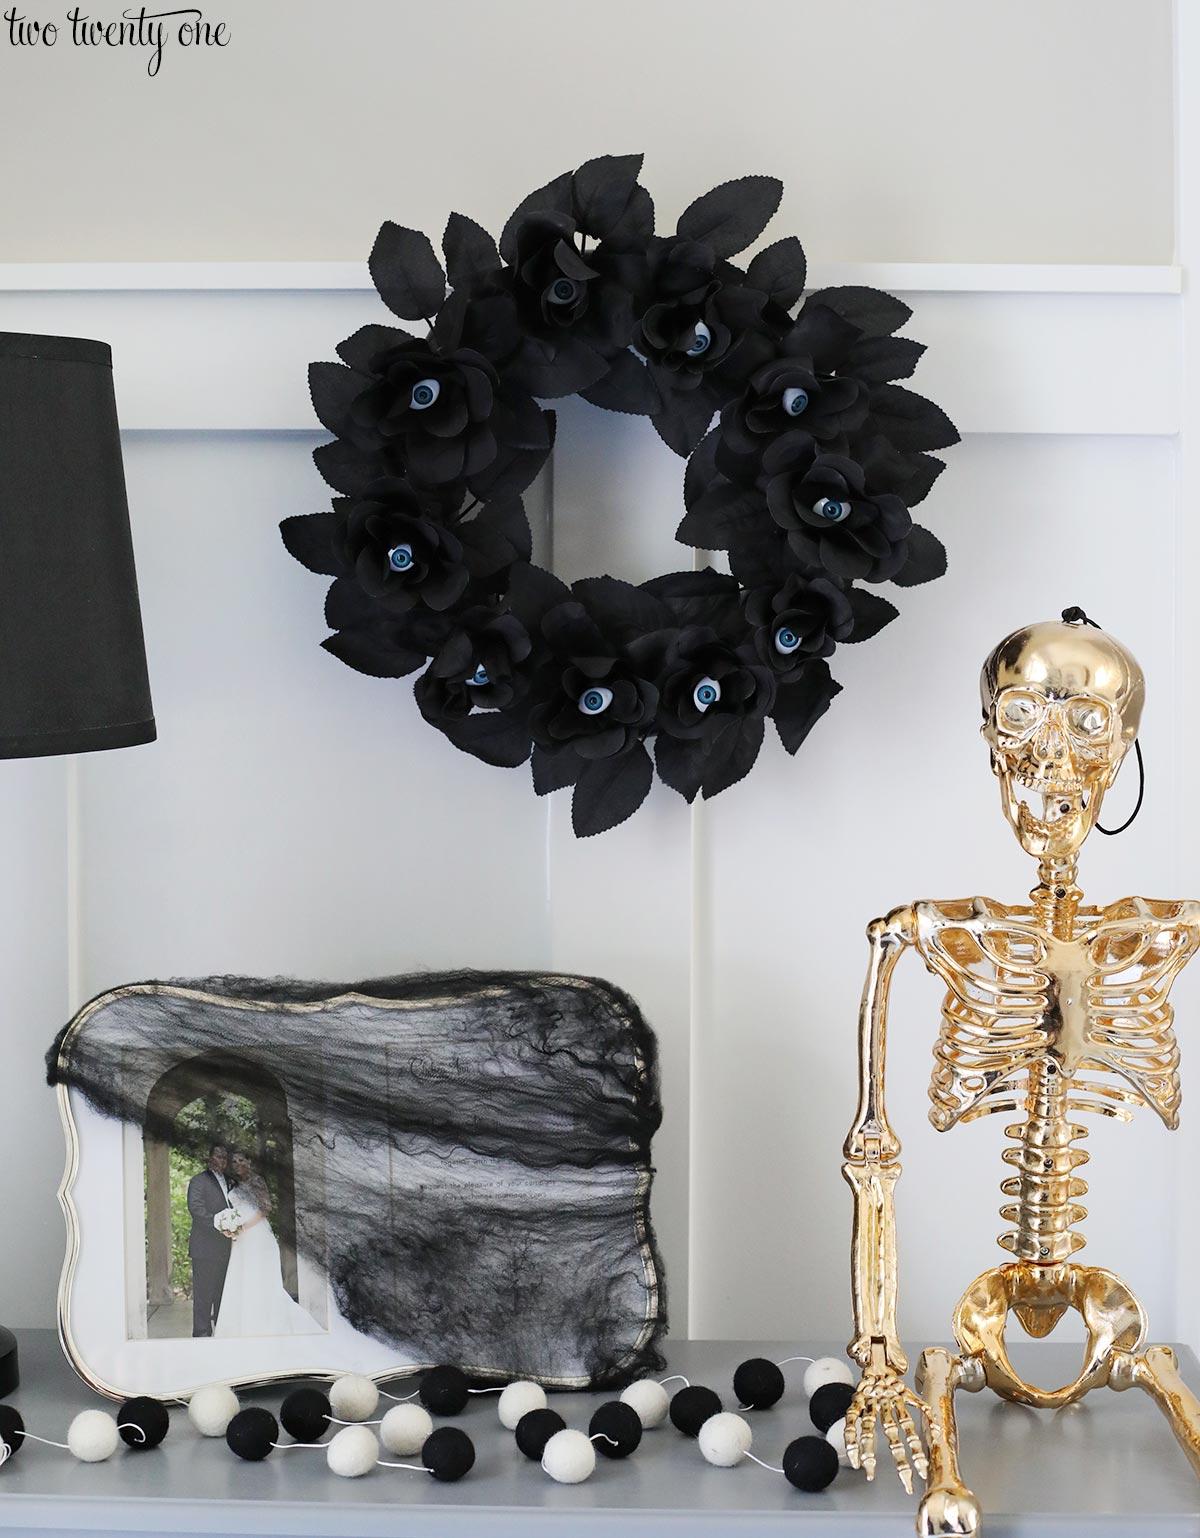 Halloween Decor Ideas Black And Gold Skeleton Glam Decor Via Two TwentyOne